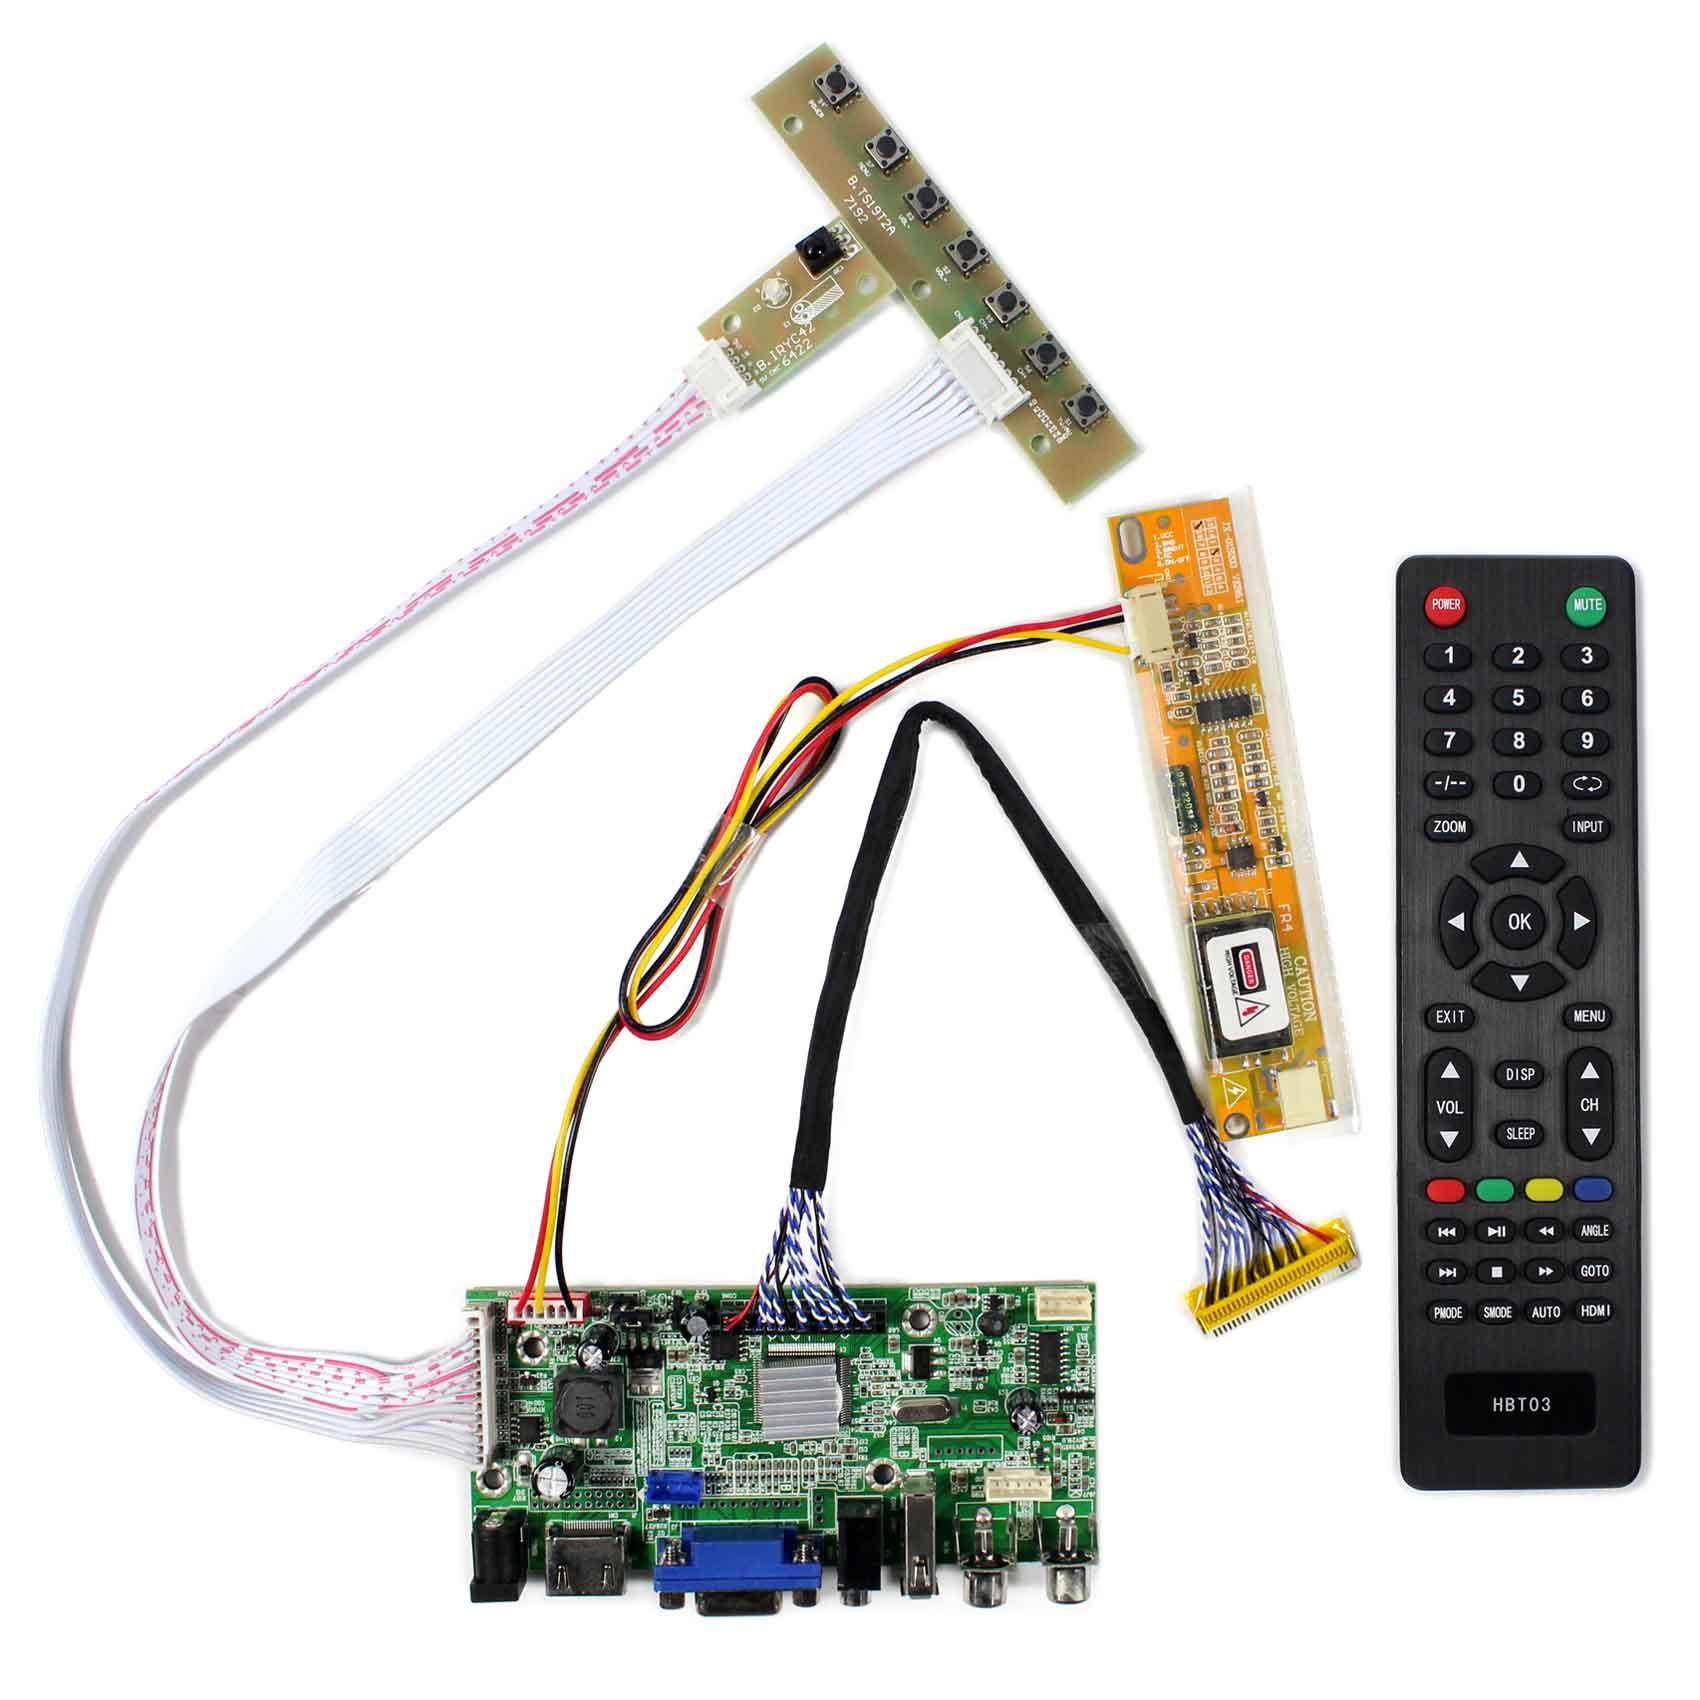 HDMI+VGA+2AV+USB+Audio LCD Controller Board for 15.4inch 17inch 1440x900 LP154WP1 B170PW03 LCD Screen hdmi vga 2av audio lcd driver board for 17inch 19inch m190eg03 1280x1024 lcd m170eg01 m170en06 5 ltm170e6 ltm170e8 hsd170me13